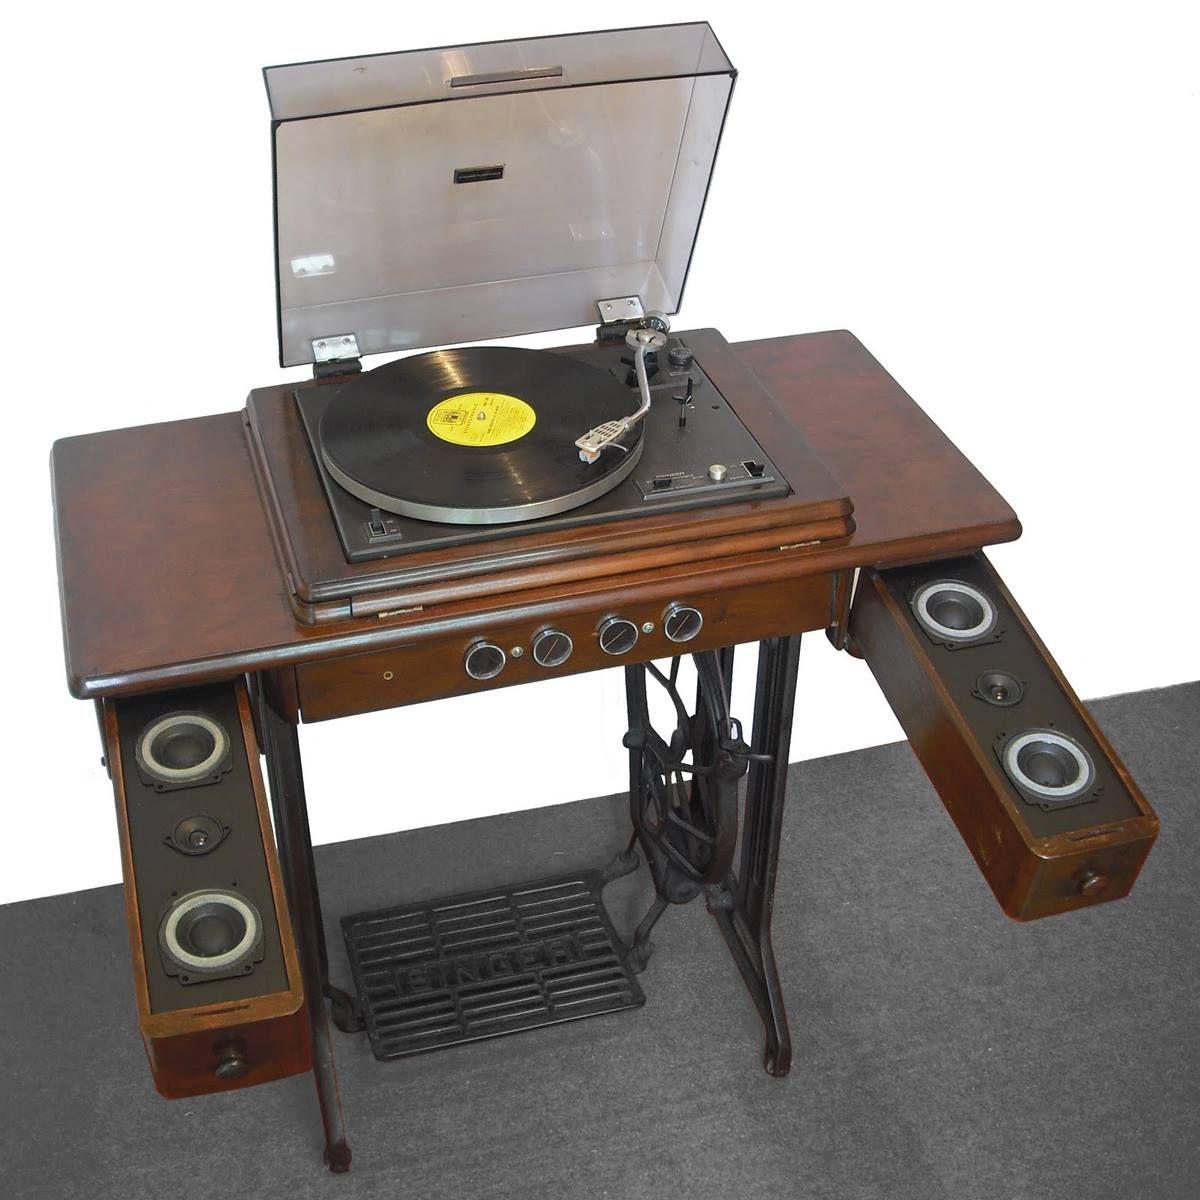 Vintage singer sewing machine table w customized sound system vintage singer sewing machine table w customized sound system watchthetrailerfo